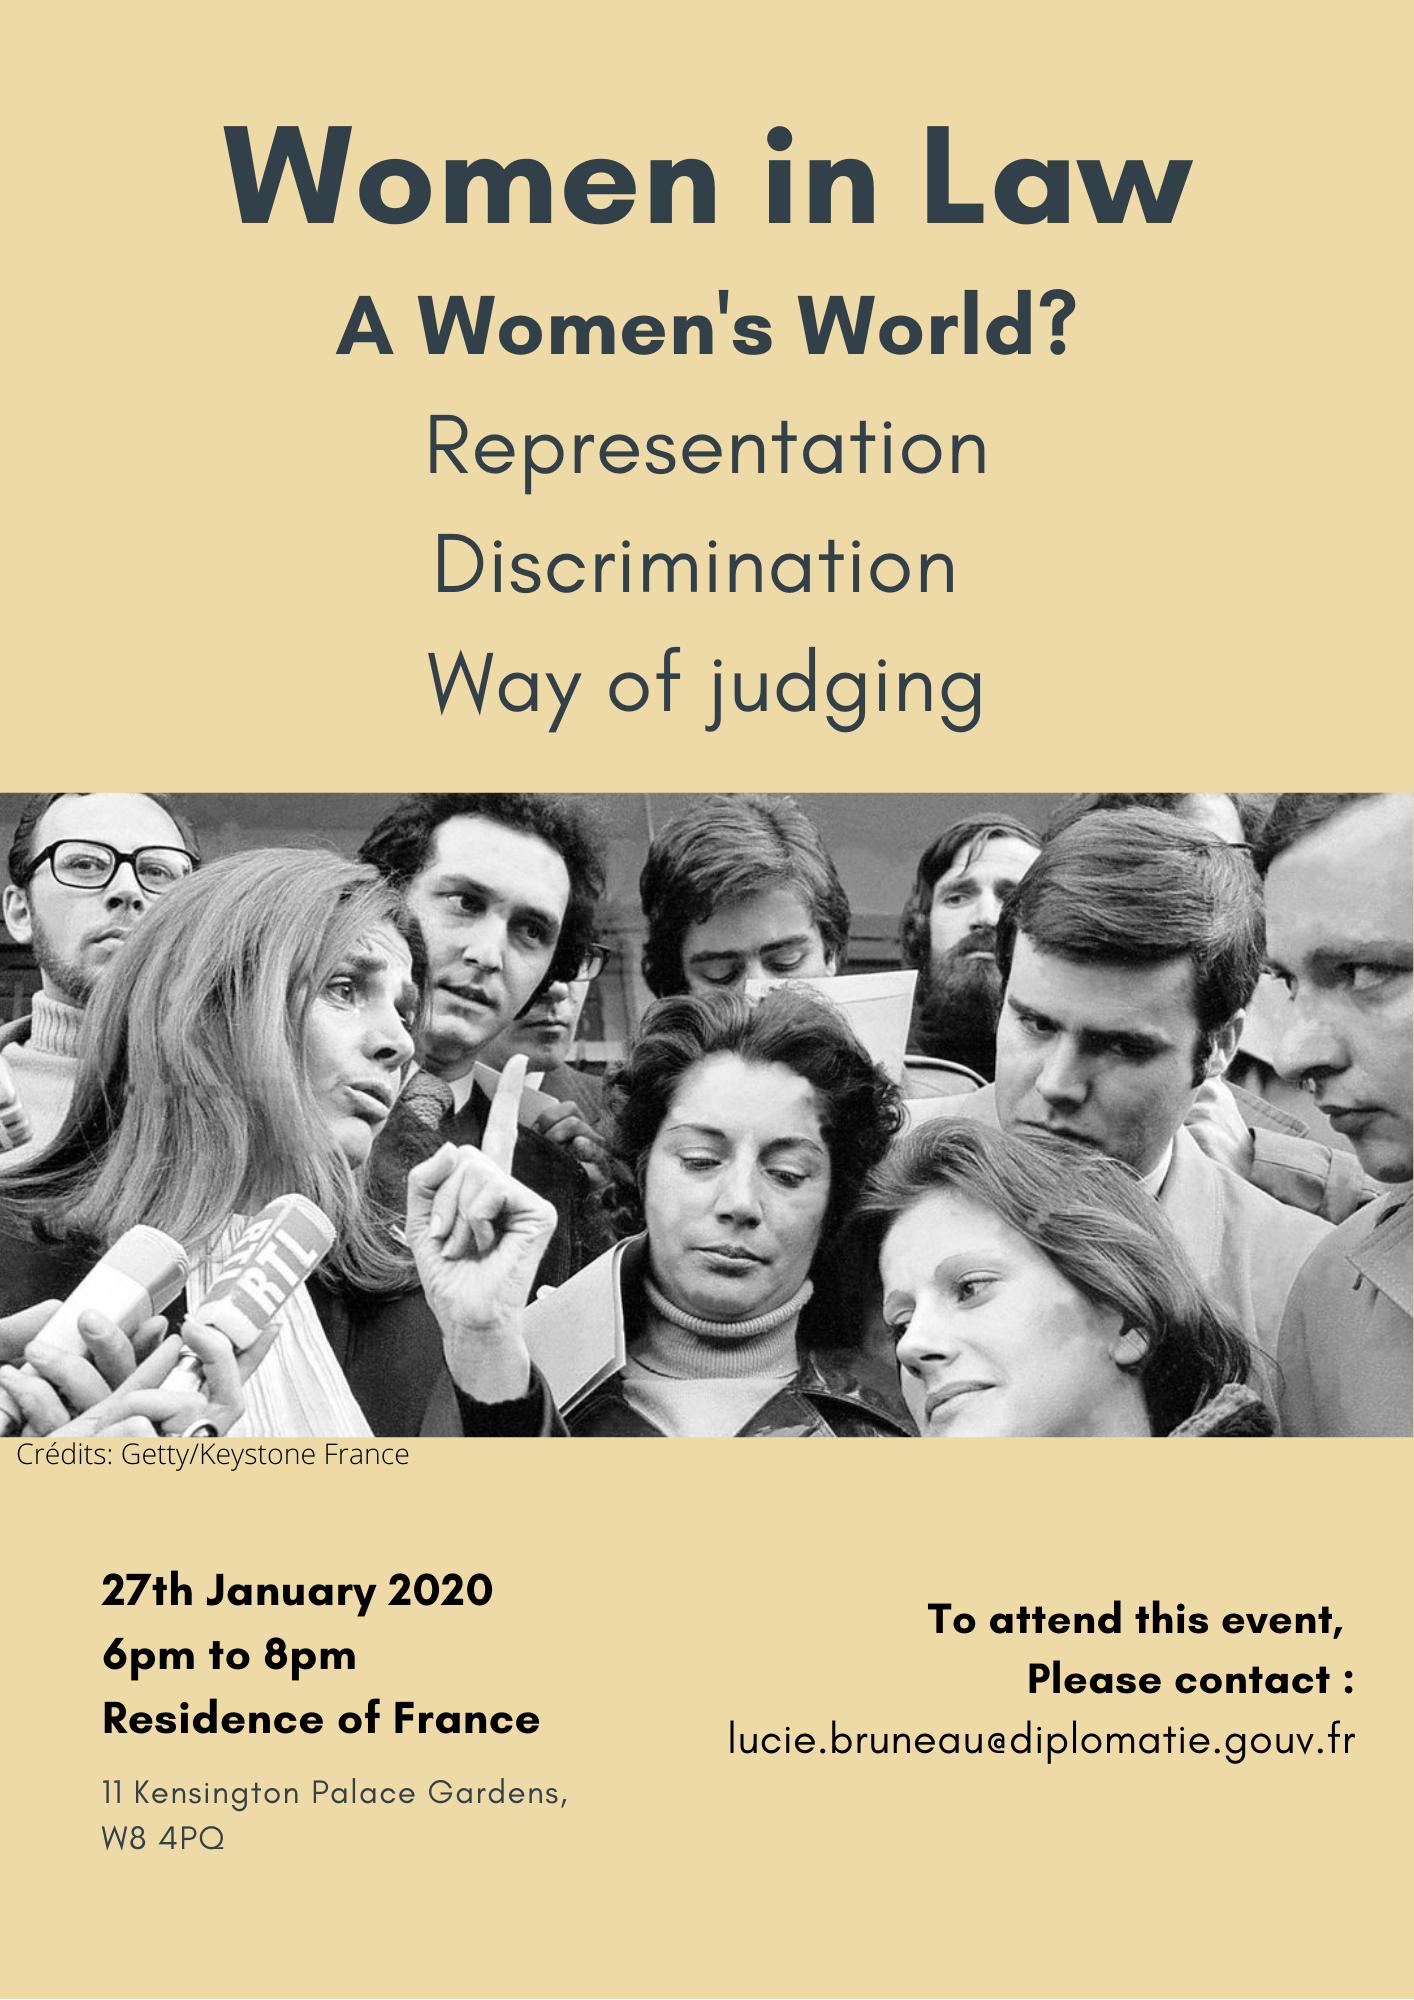 Women in Law: A Women's World? Roundtable 27 January 2020